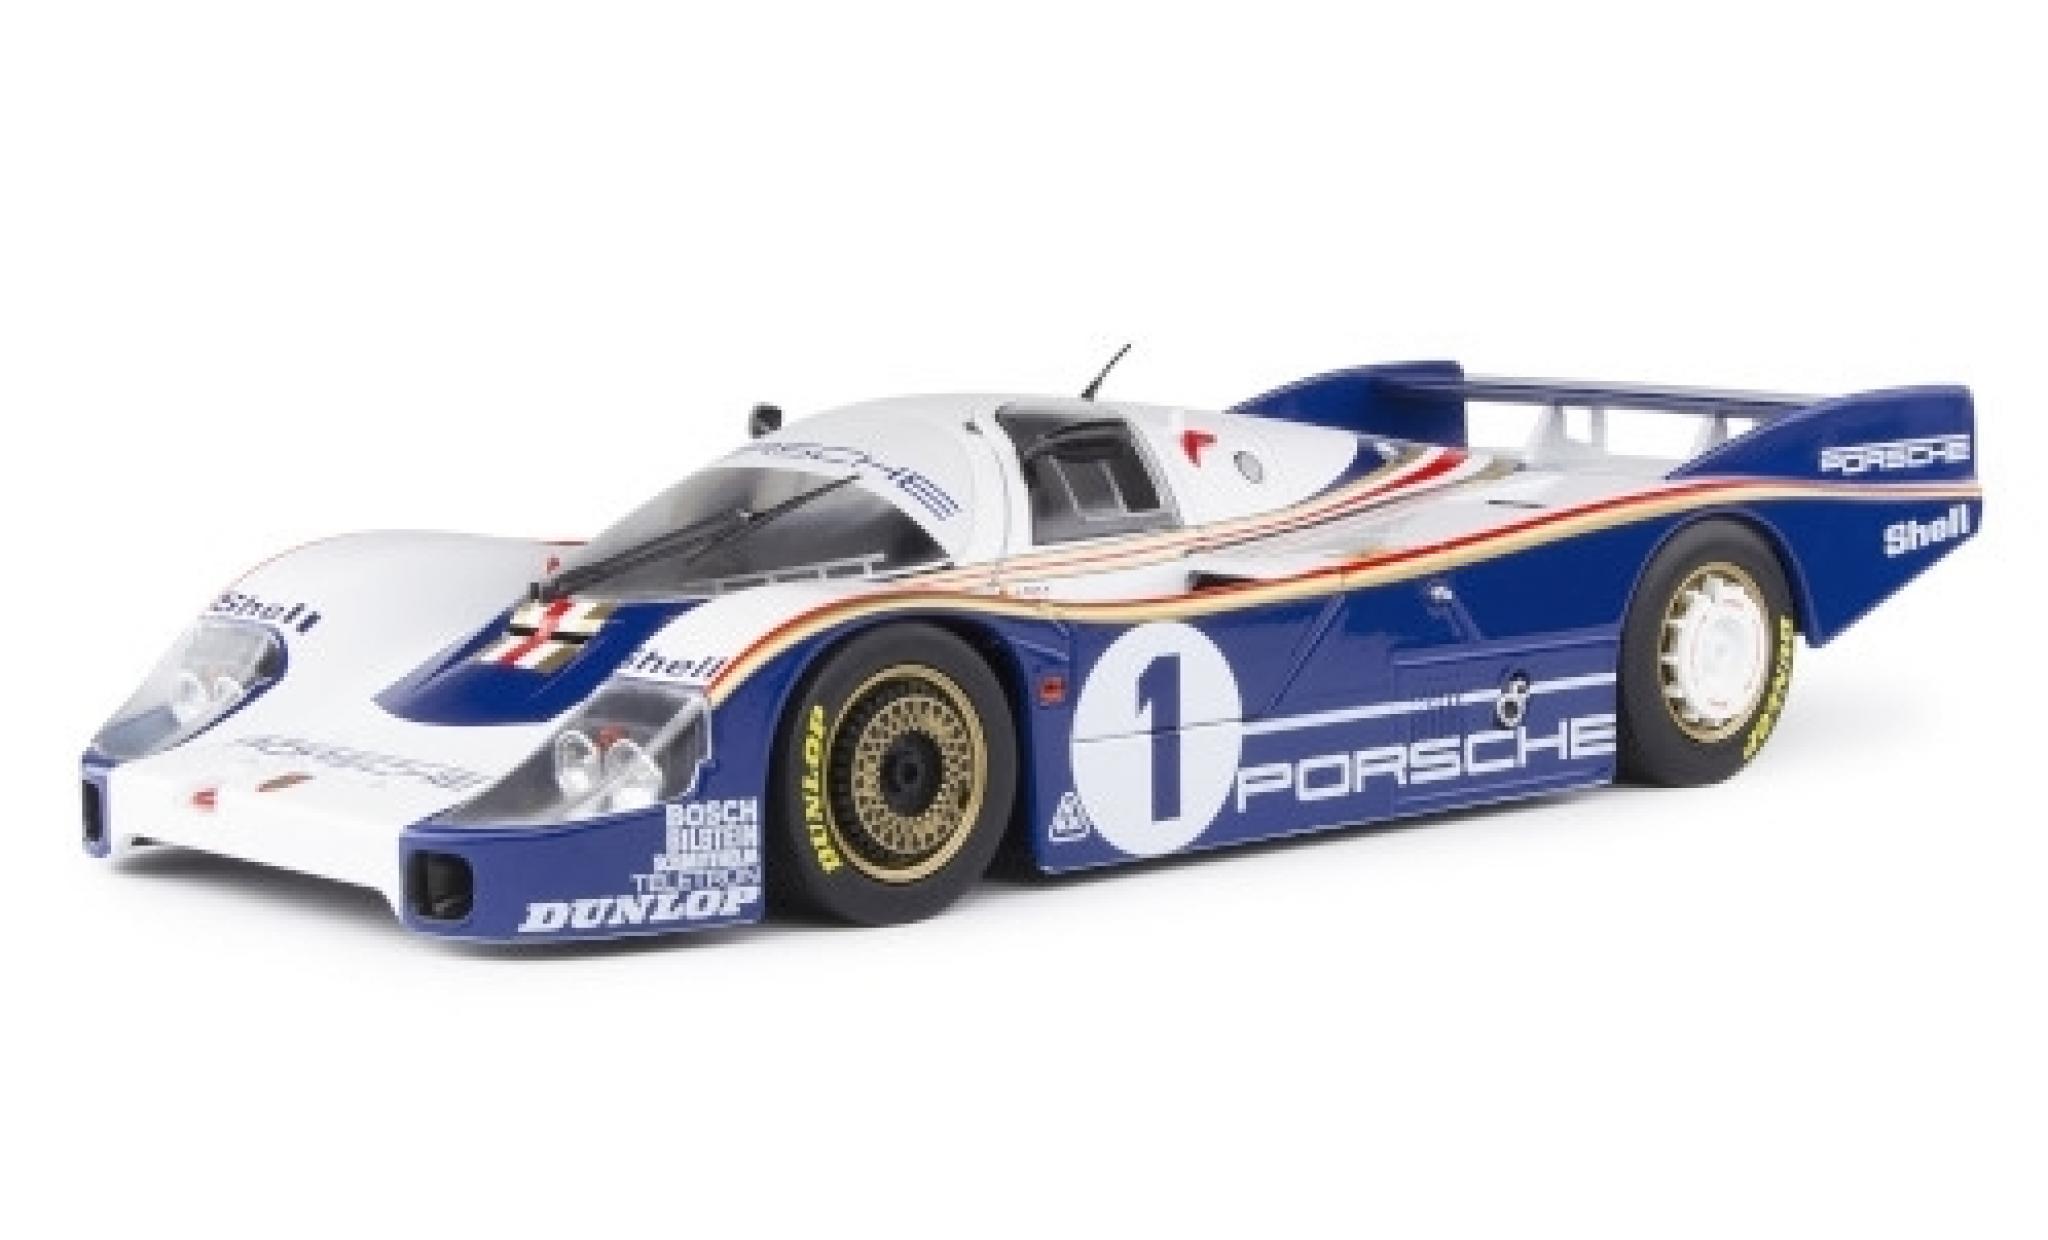 Porsche 956 1982 1/18 Solido LH RHD No.1 Rothmans System Rothmans 24h Le Mans y compris les Decals D.Bell/J.Ickx